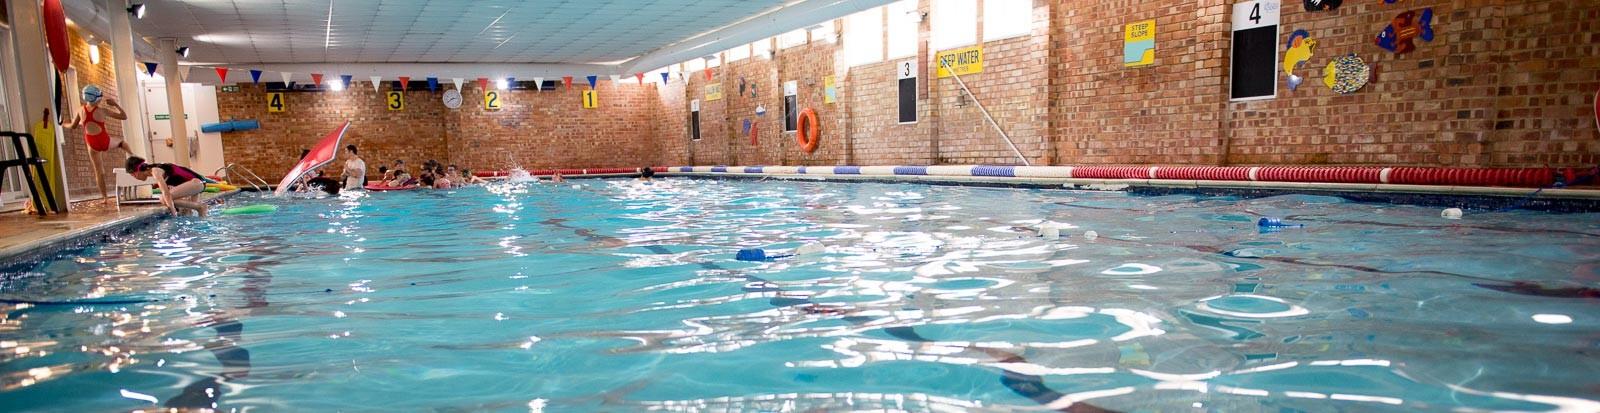 Shirley Swimming Pool Swimming Lessons Southampton